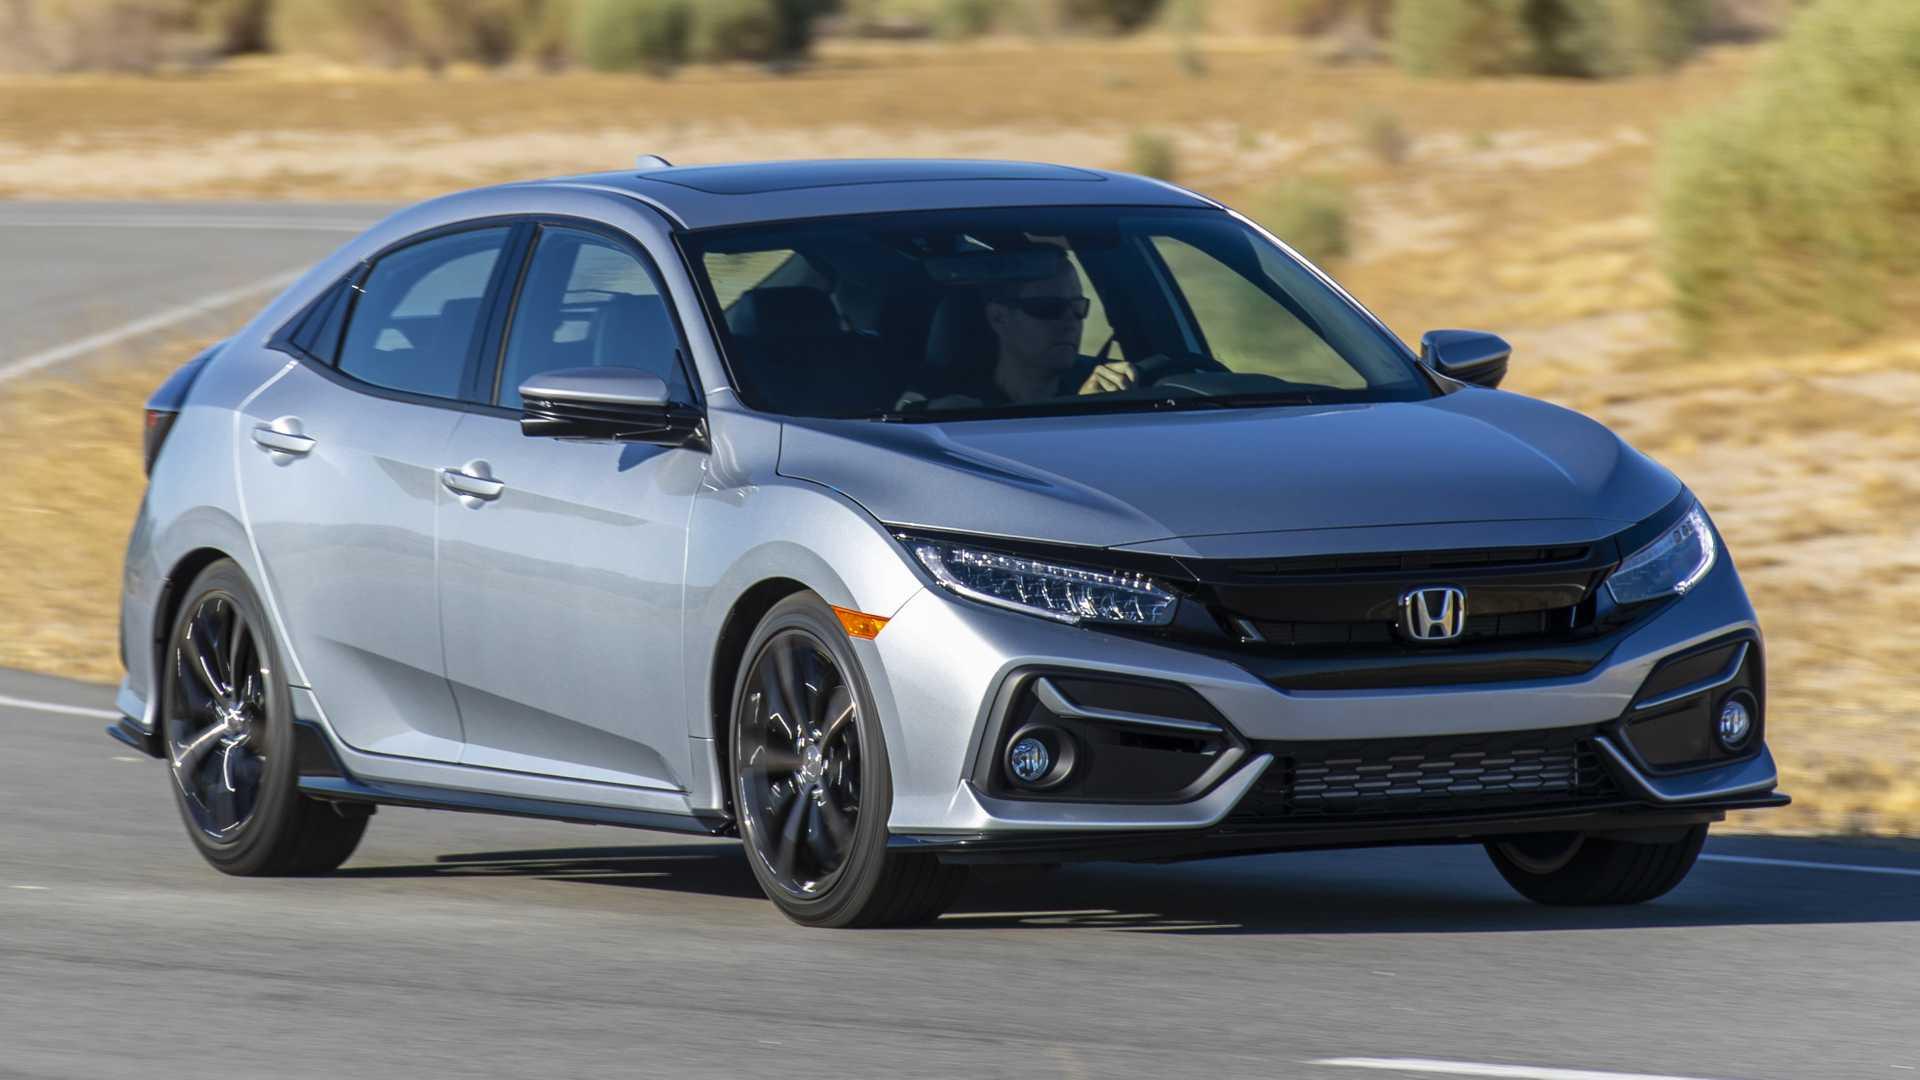 2020 Honda Civic Hatchback Front Three-Quarter Wallpapers (1)